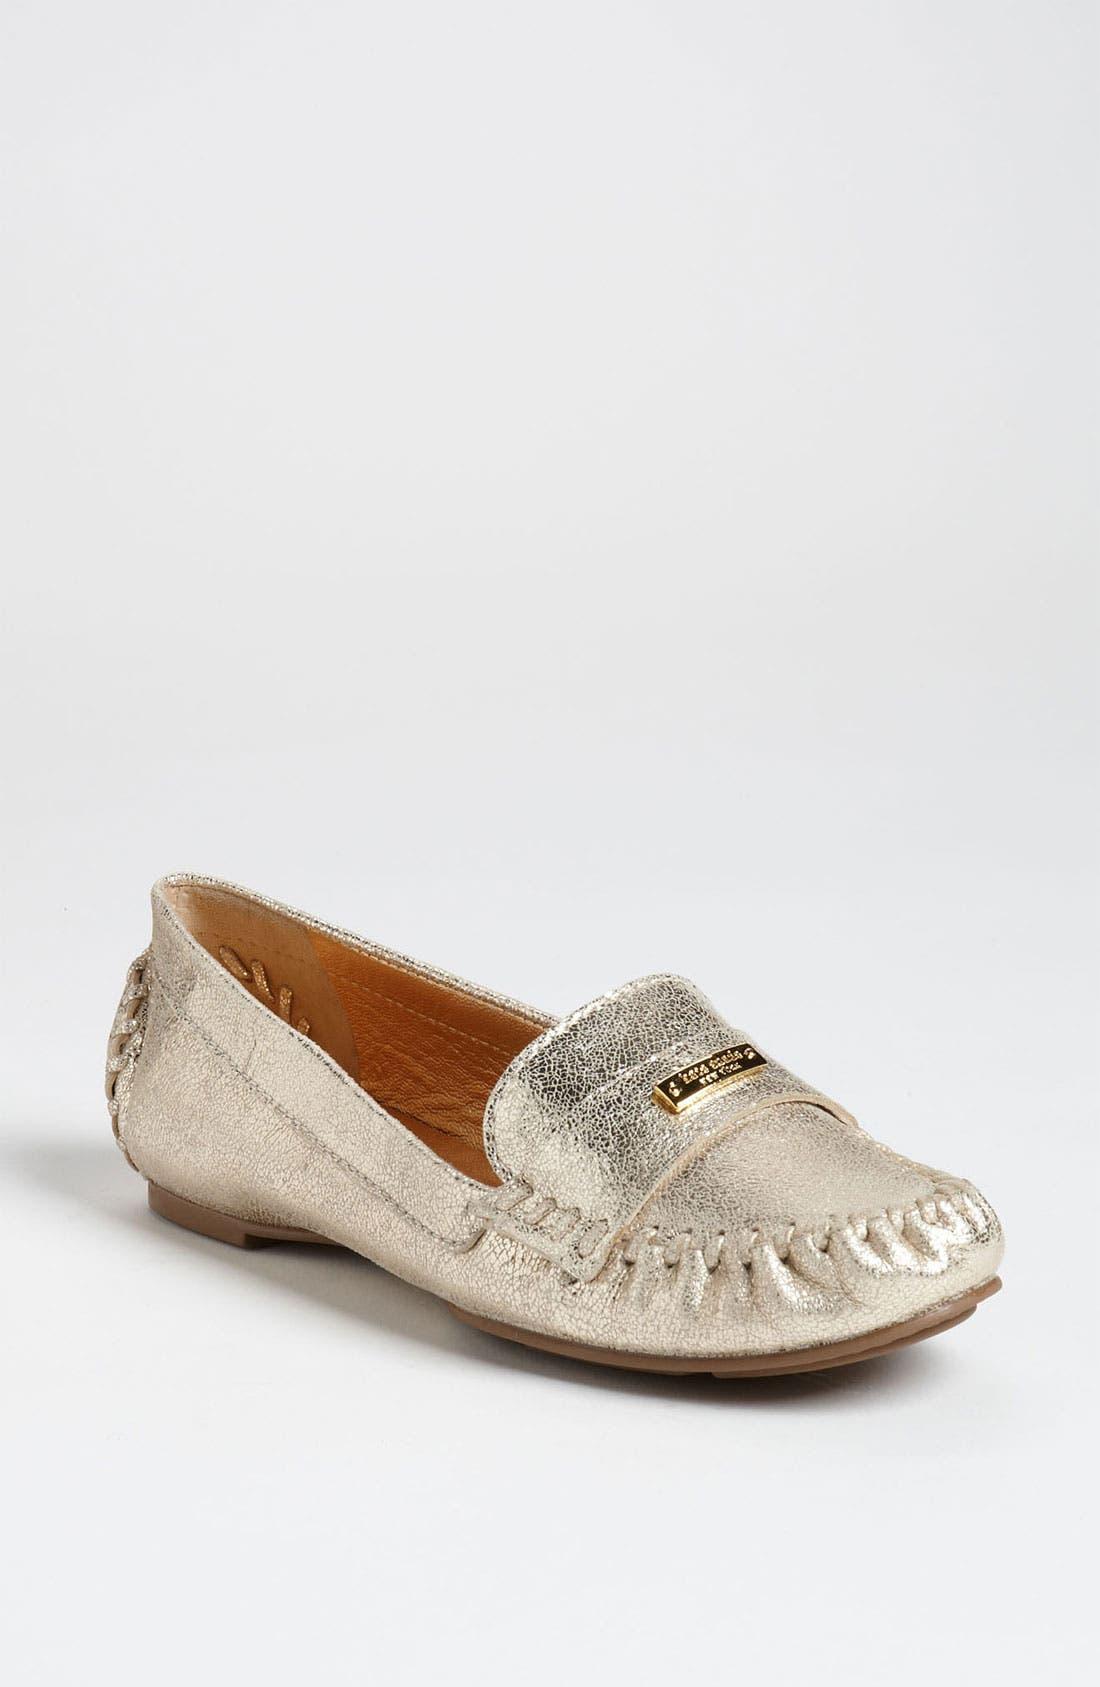 Main Image - kate spade new york 'weekend' loafer